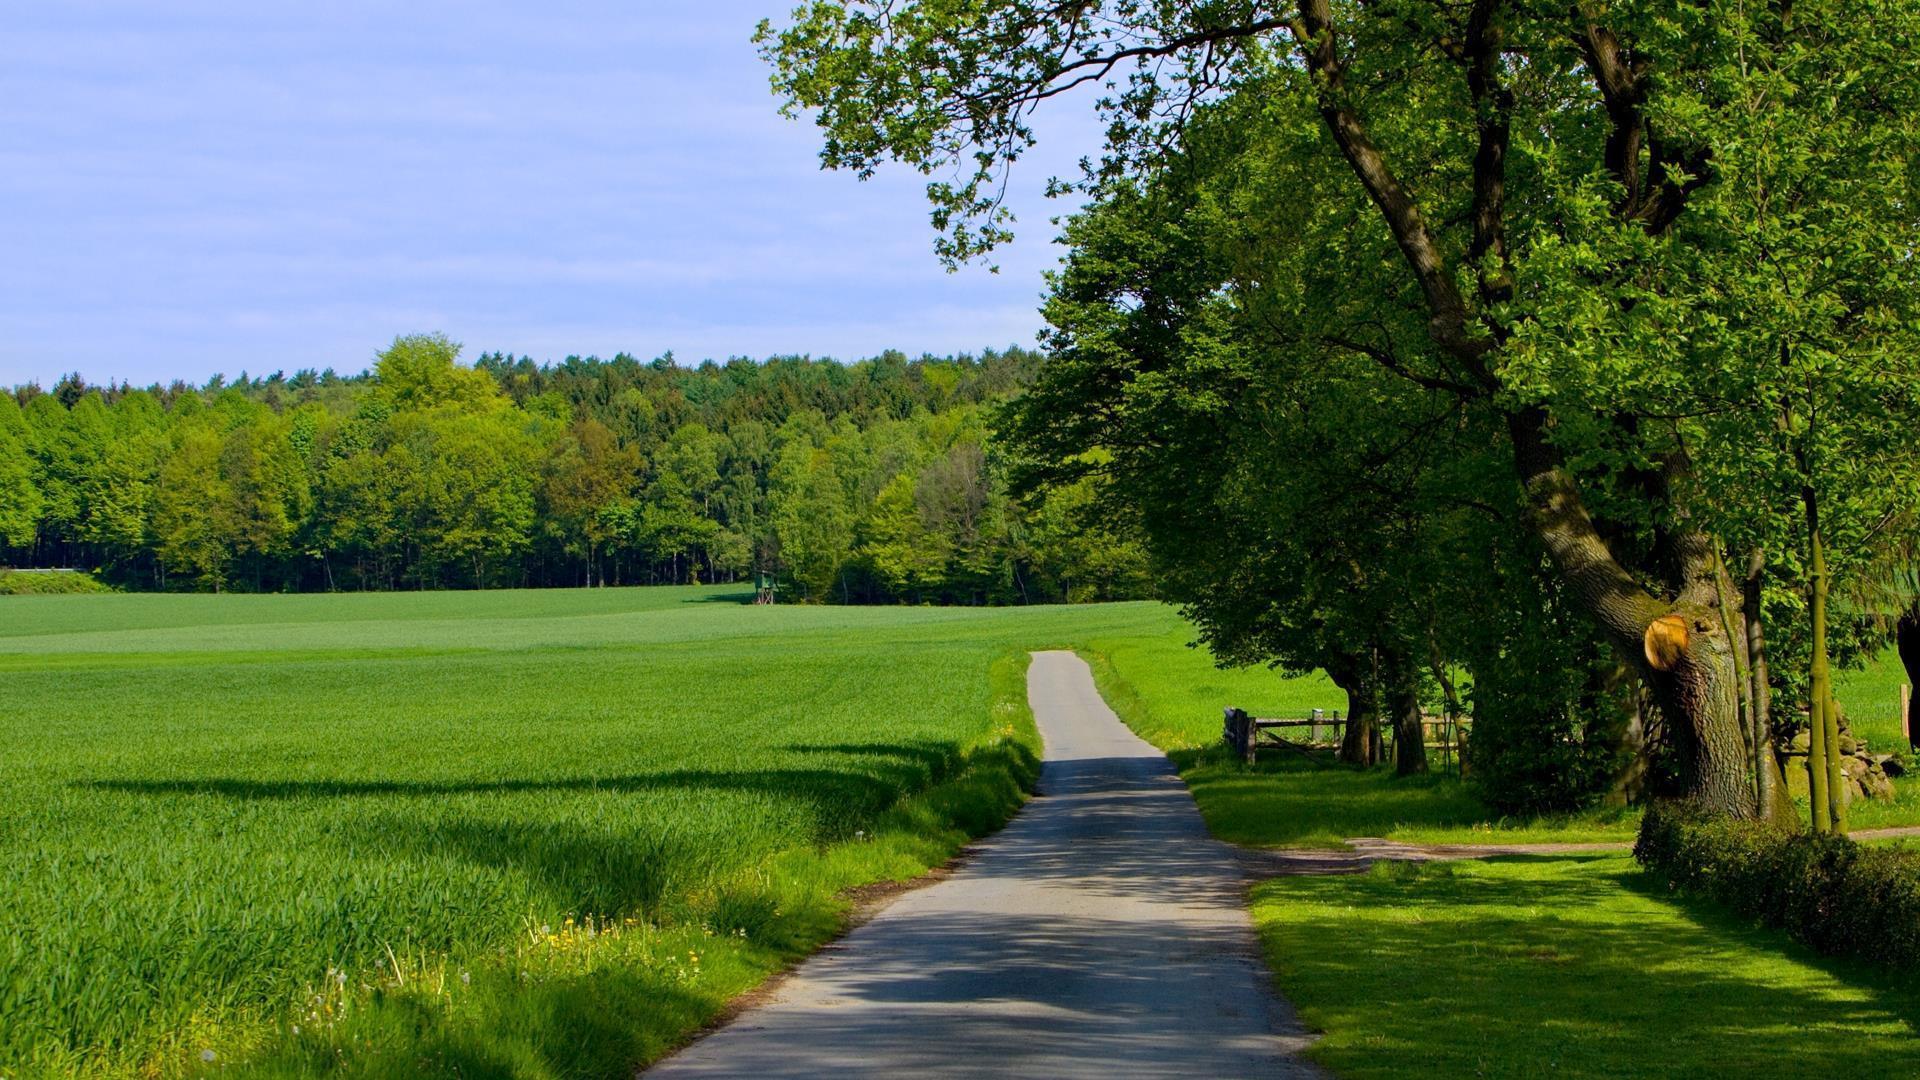 arbres-et-foret_nature-verte_3